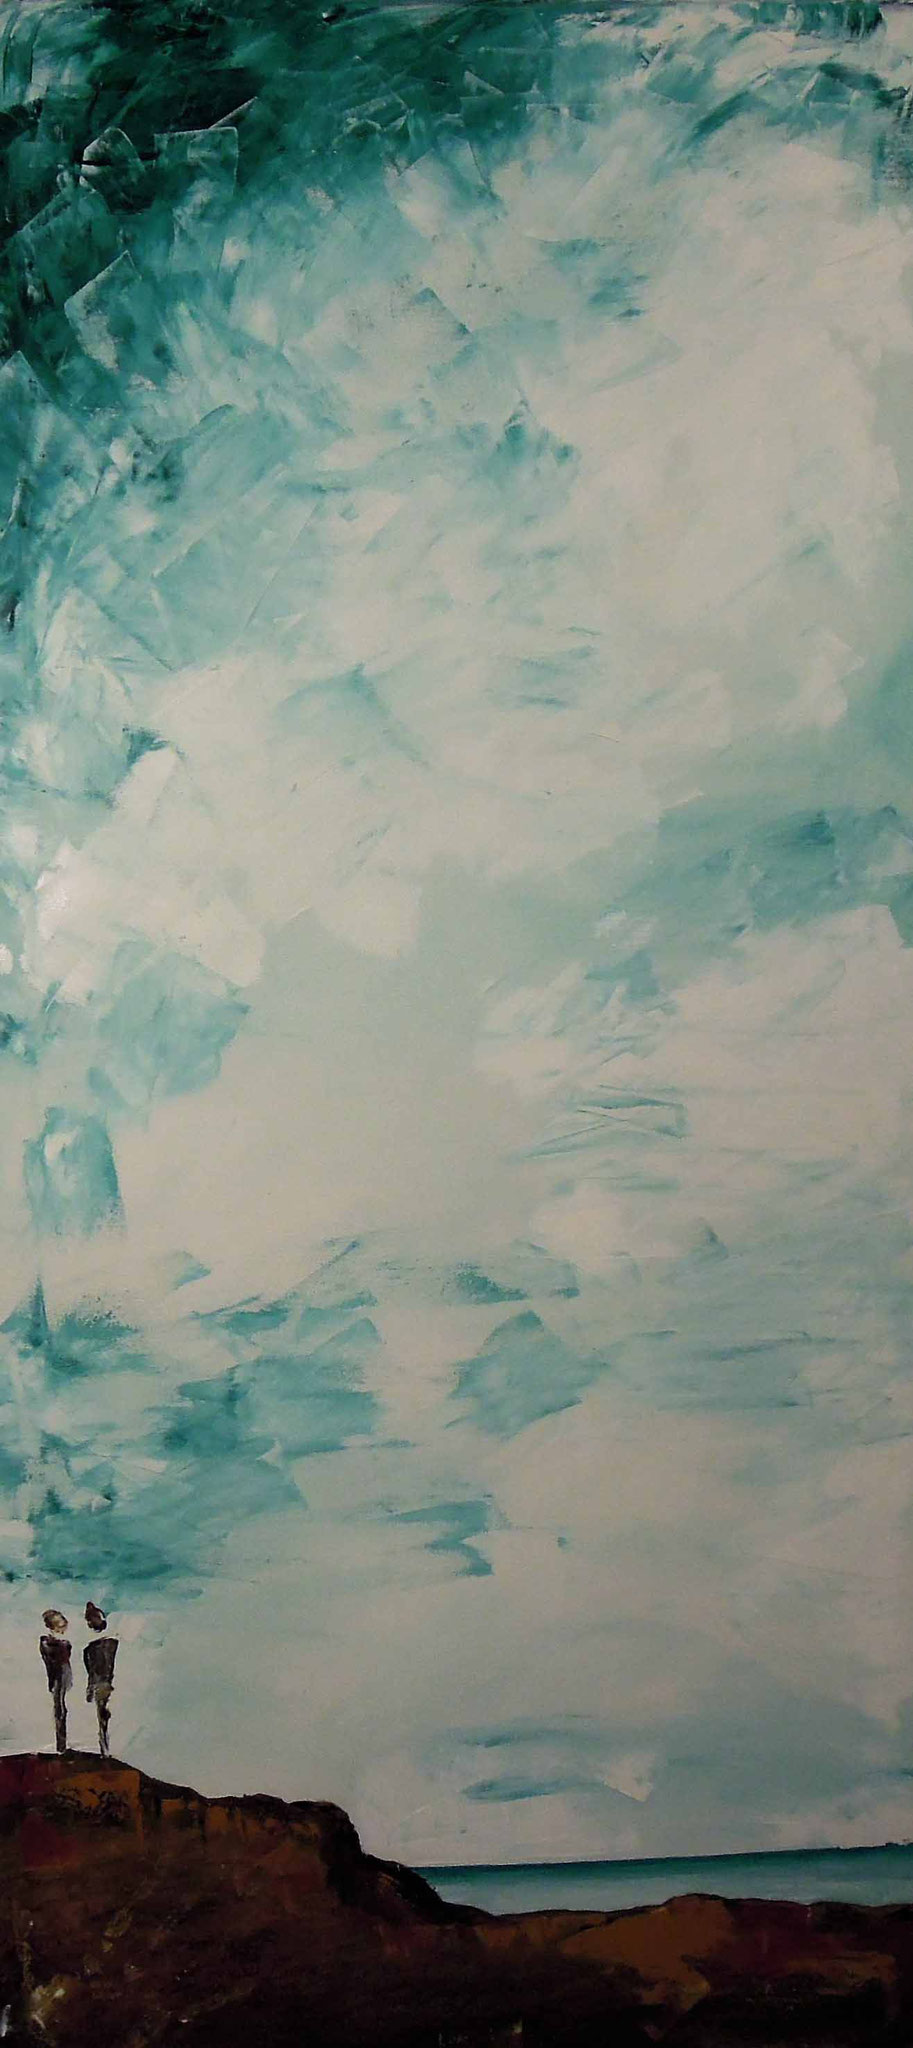 Himmelhoch - Öl auf Leinwand 60 x 130 cm